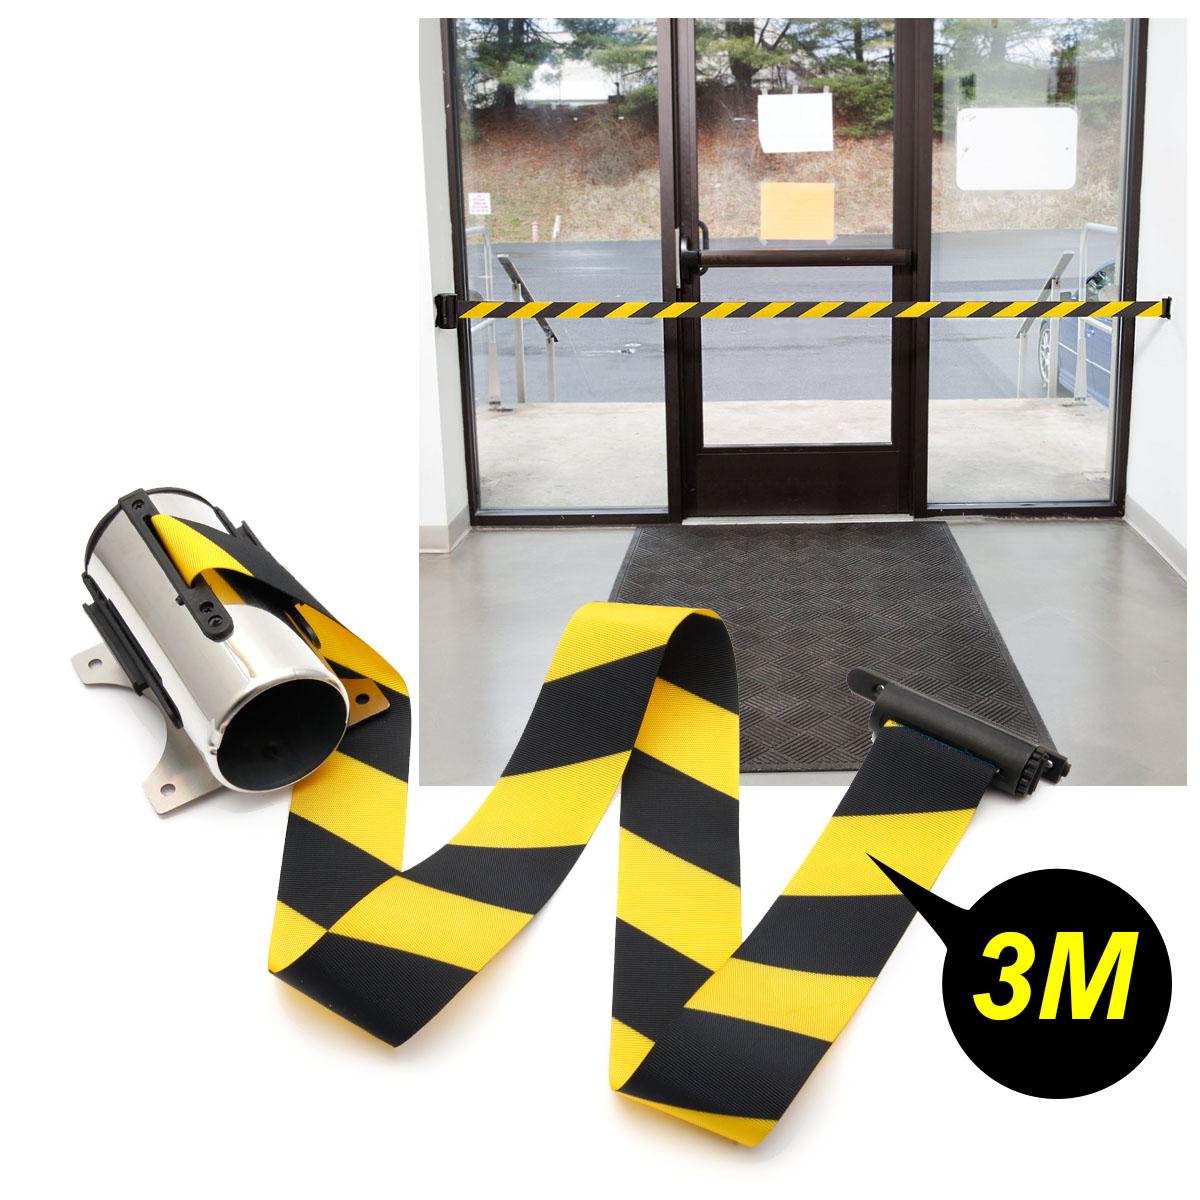 Edelstahl//Teflon Personenleitsystem Hotel Flughafen Massenkontrolle Sicherheit